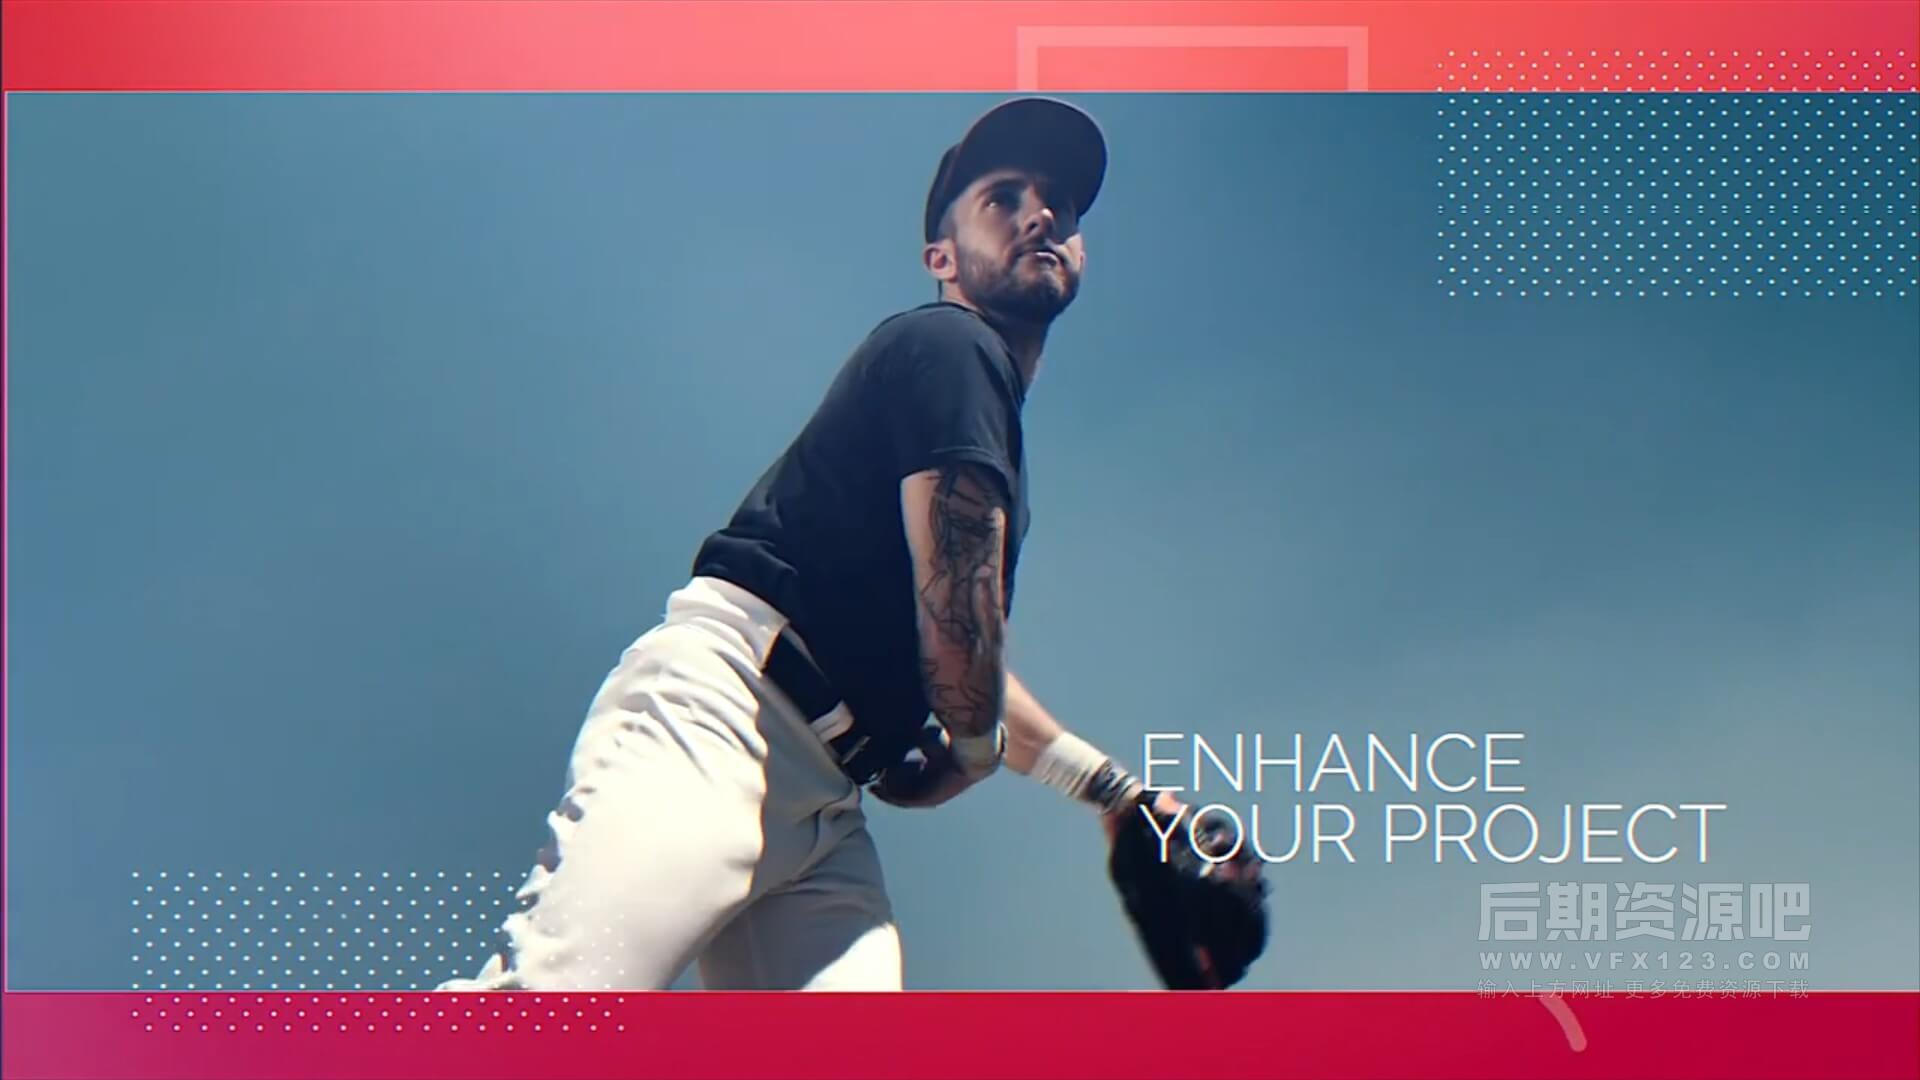 fcpx主题模板 时尚简约个人写真作品集展示模板 Playful Slideshow